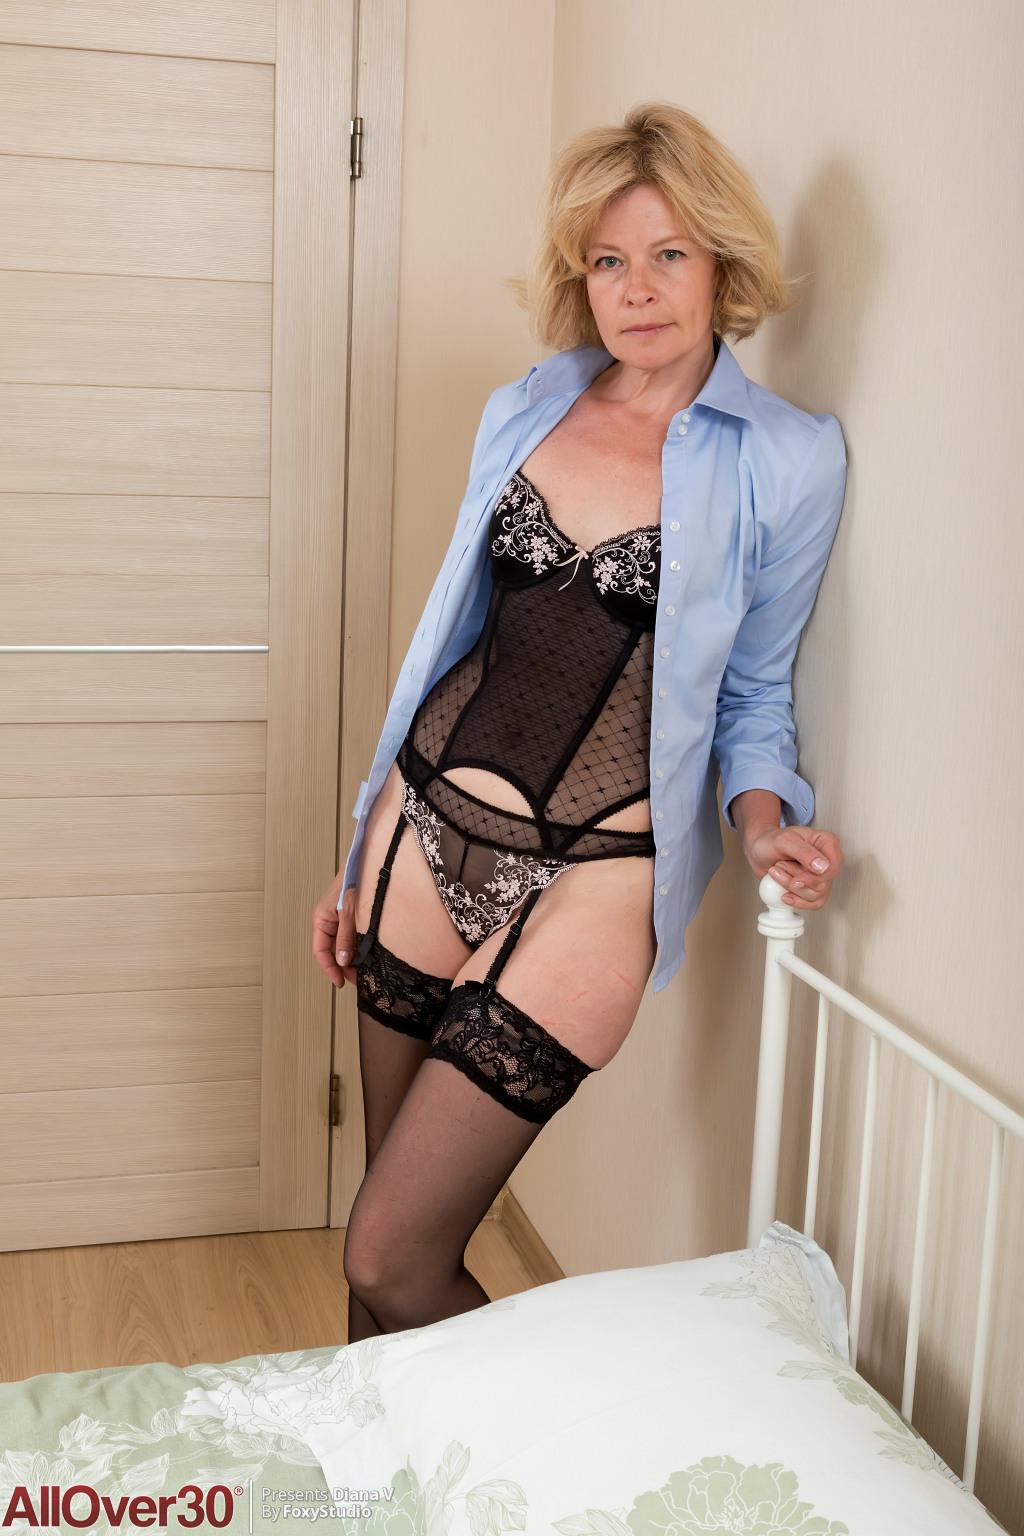 Diana V from AllOver30